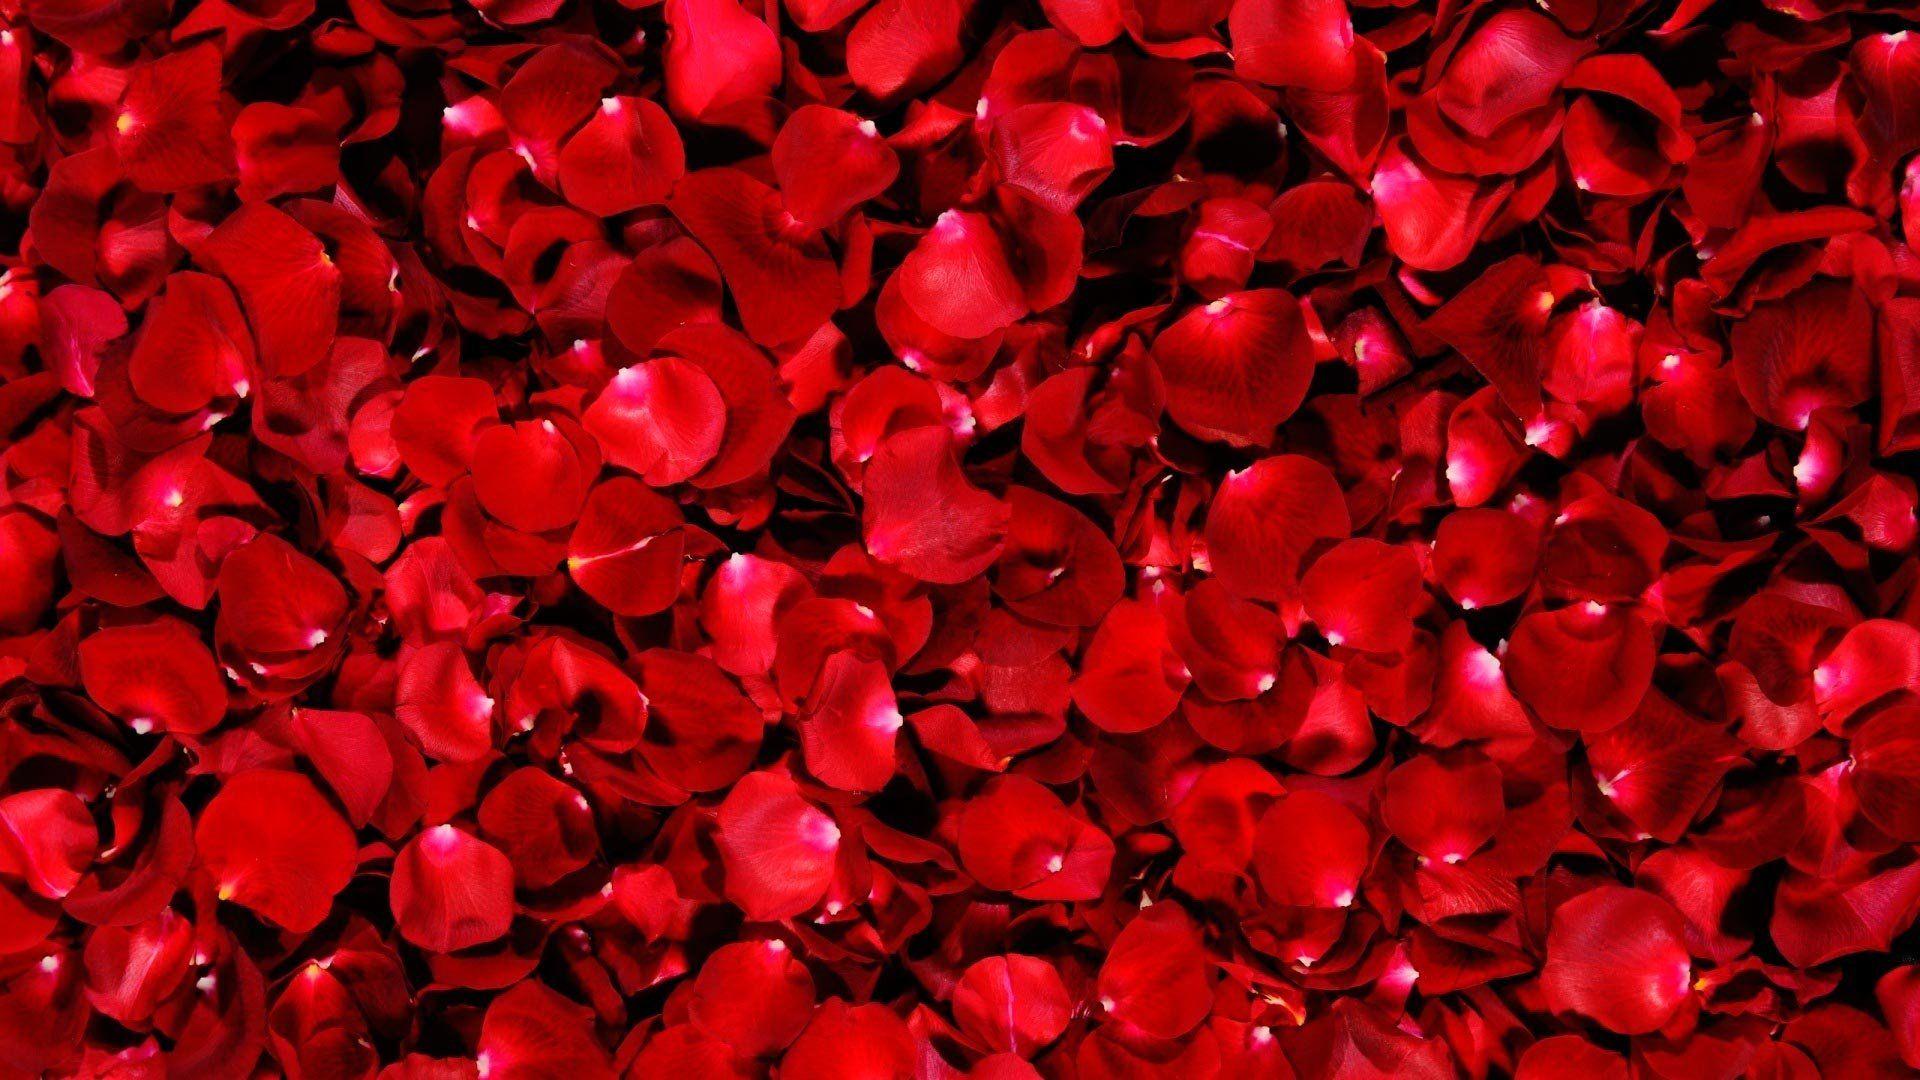 Rose Petals Google Search Red Rose Petals Red Roses Beautiful Red Roses